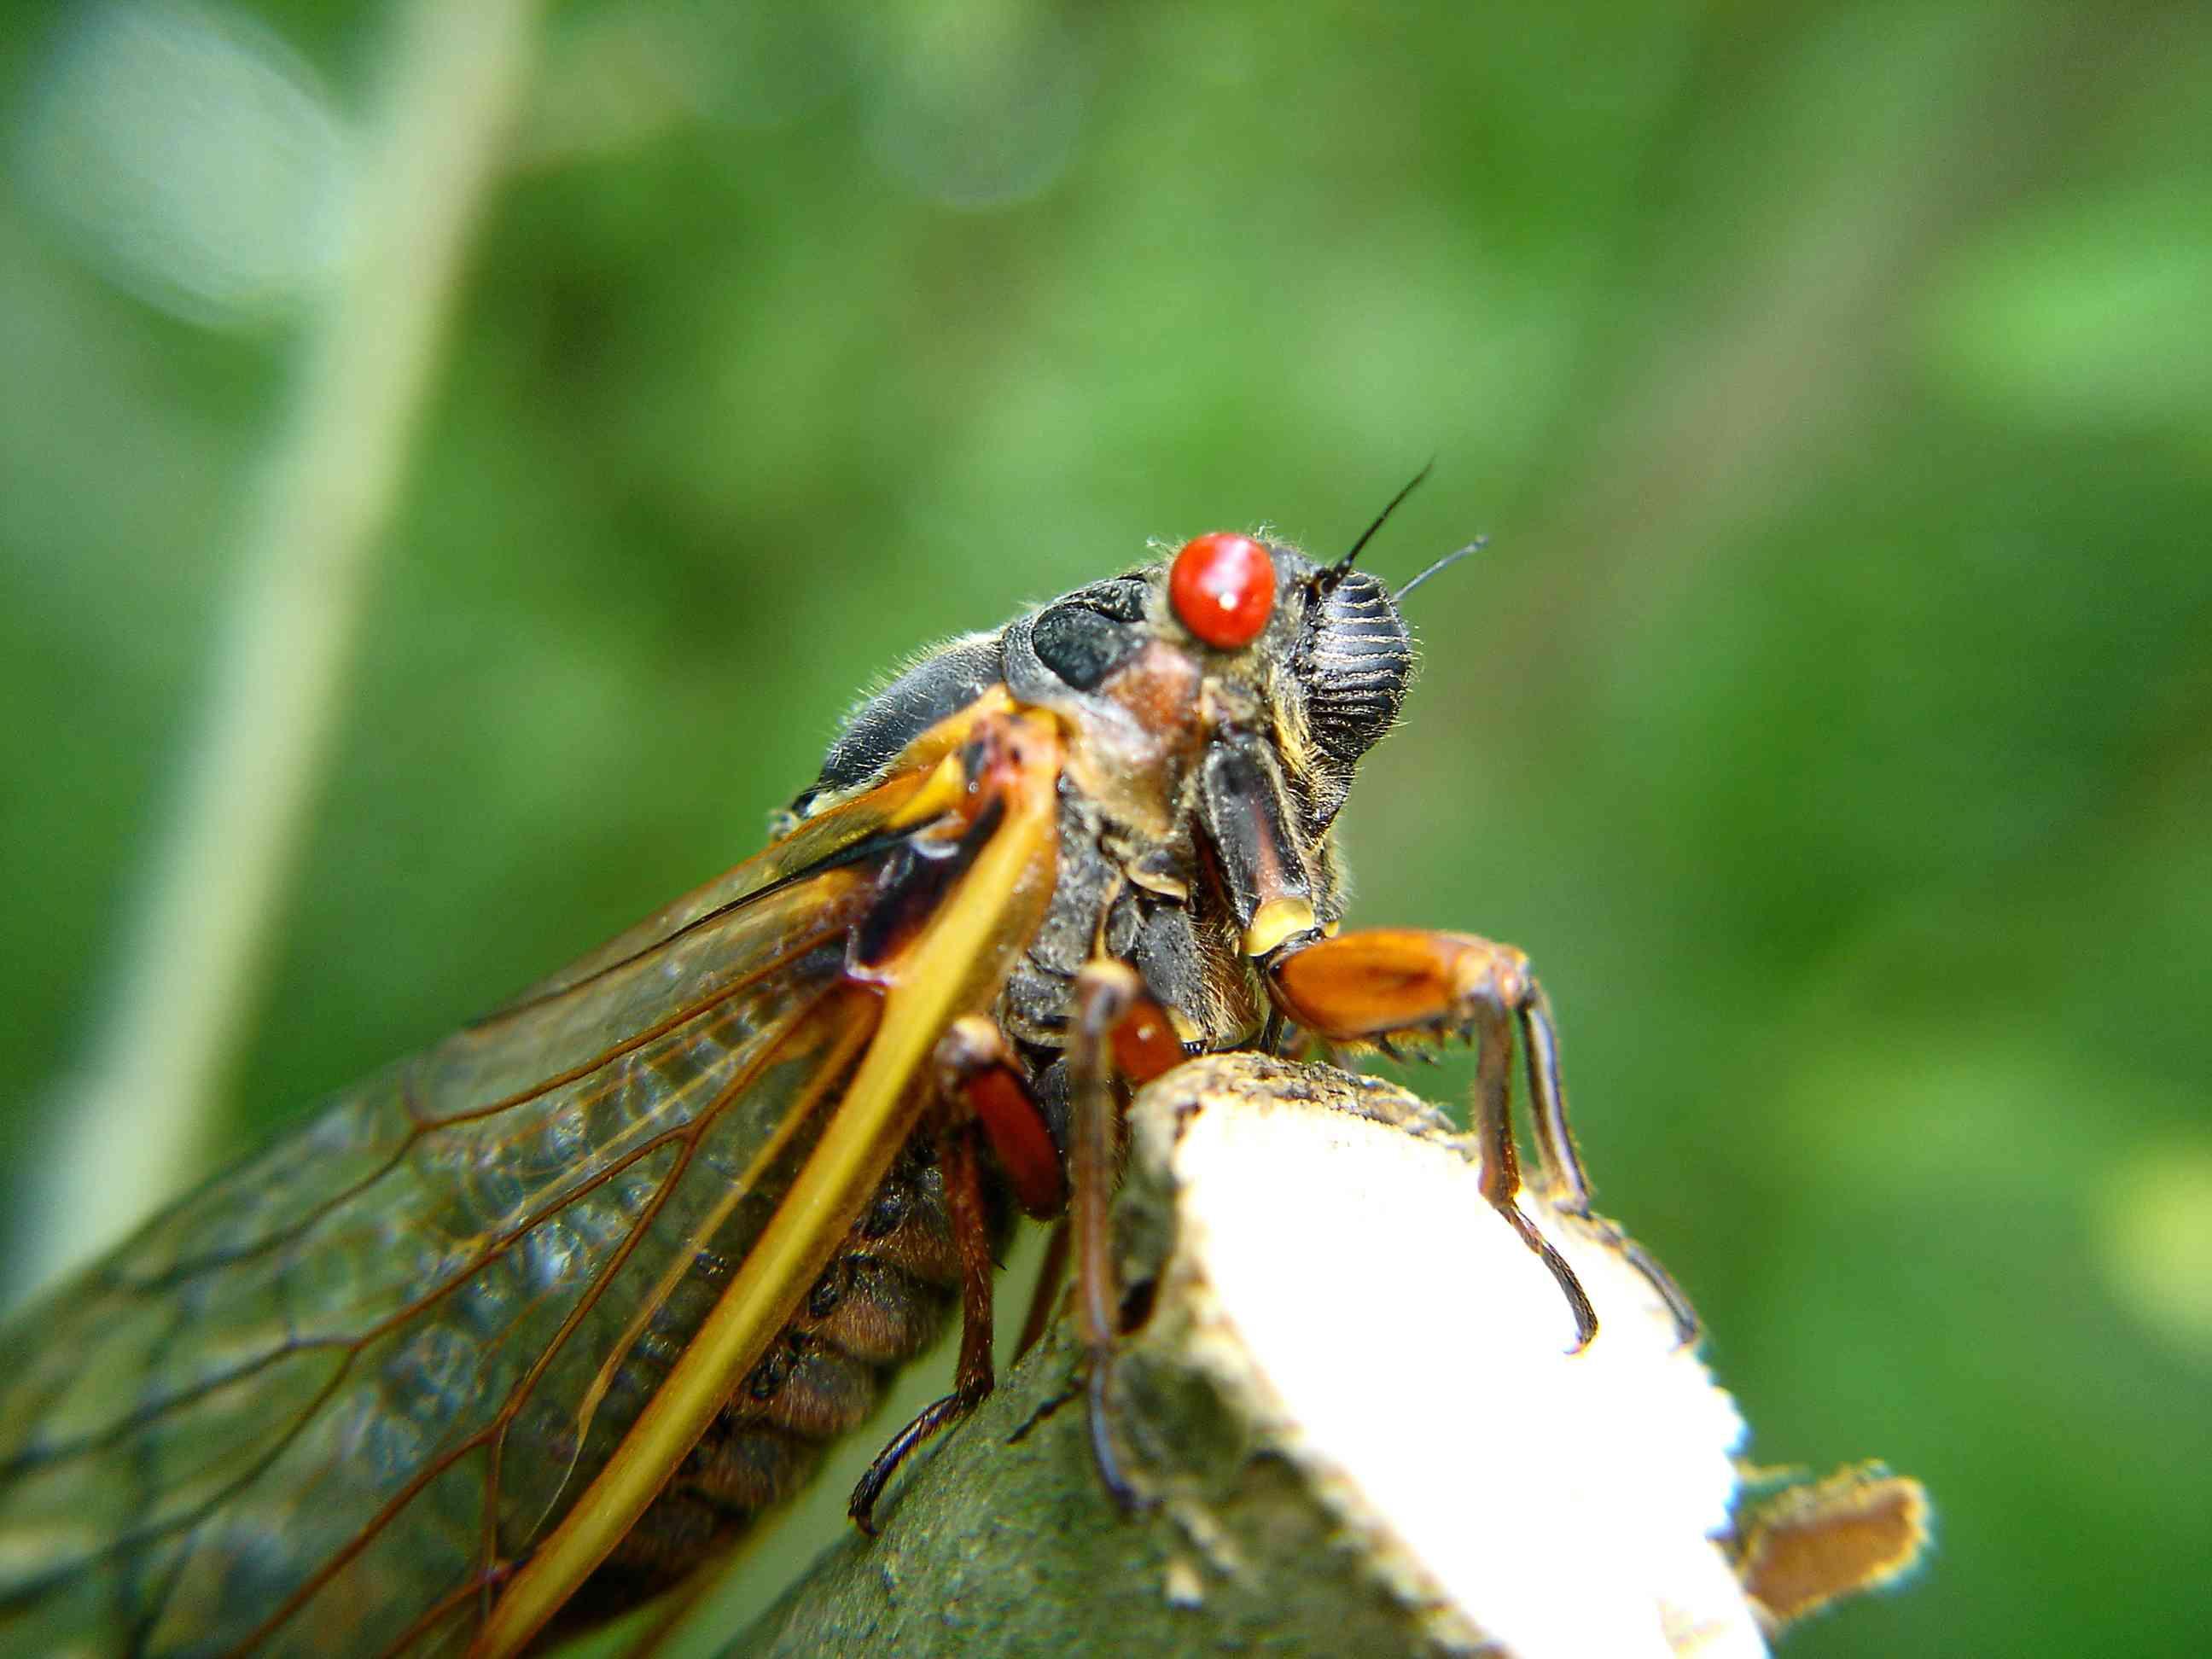 Magicicada, or periodical cicada